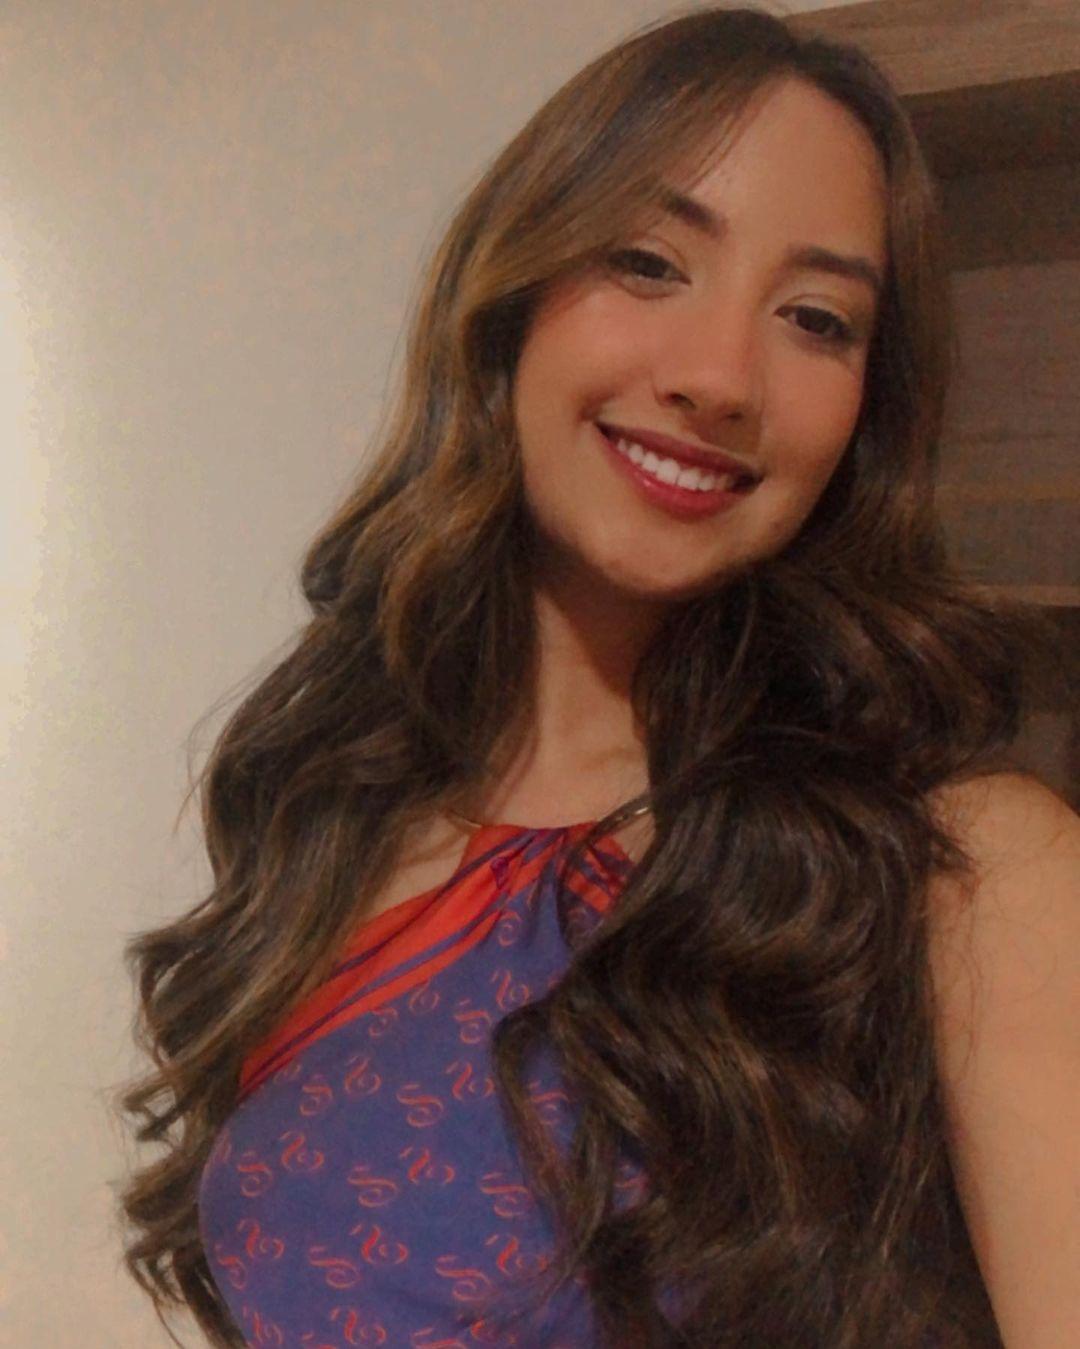 sandy menezes, miss grande sao paulo mundo 2019. - Página 2 Pxdz110